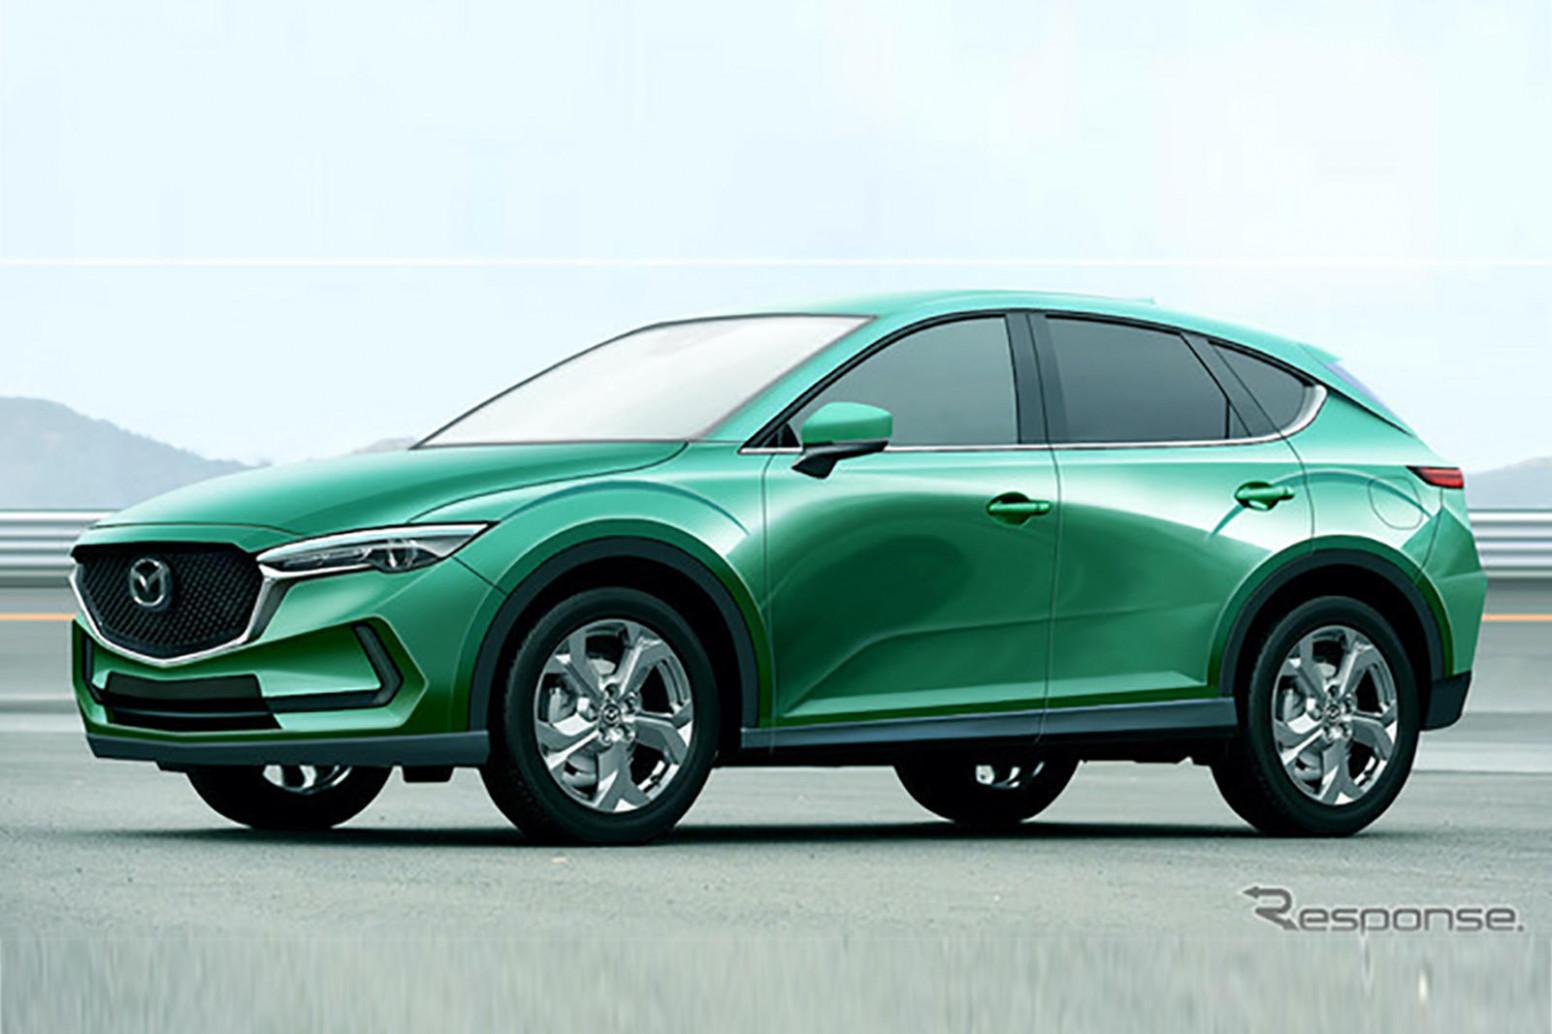 Overview 2022 Mazda CX-9s